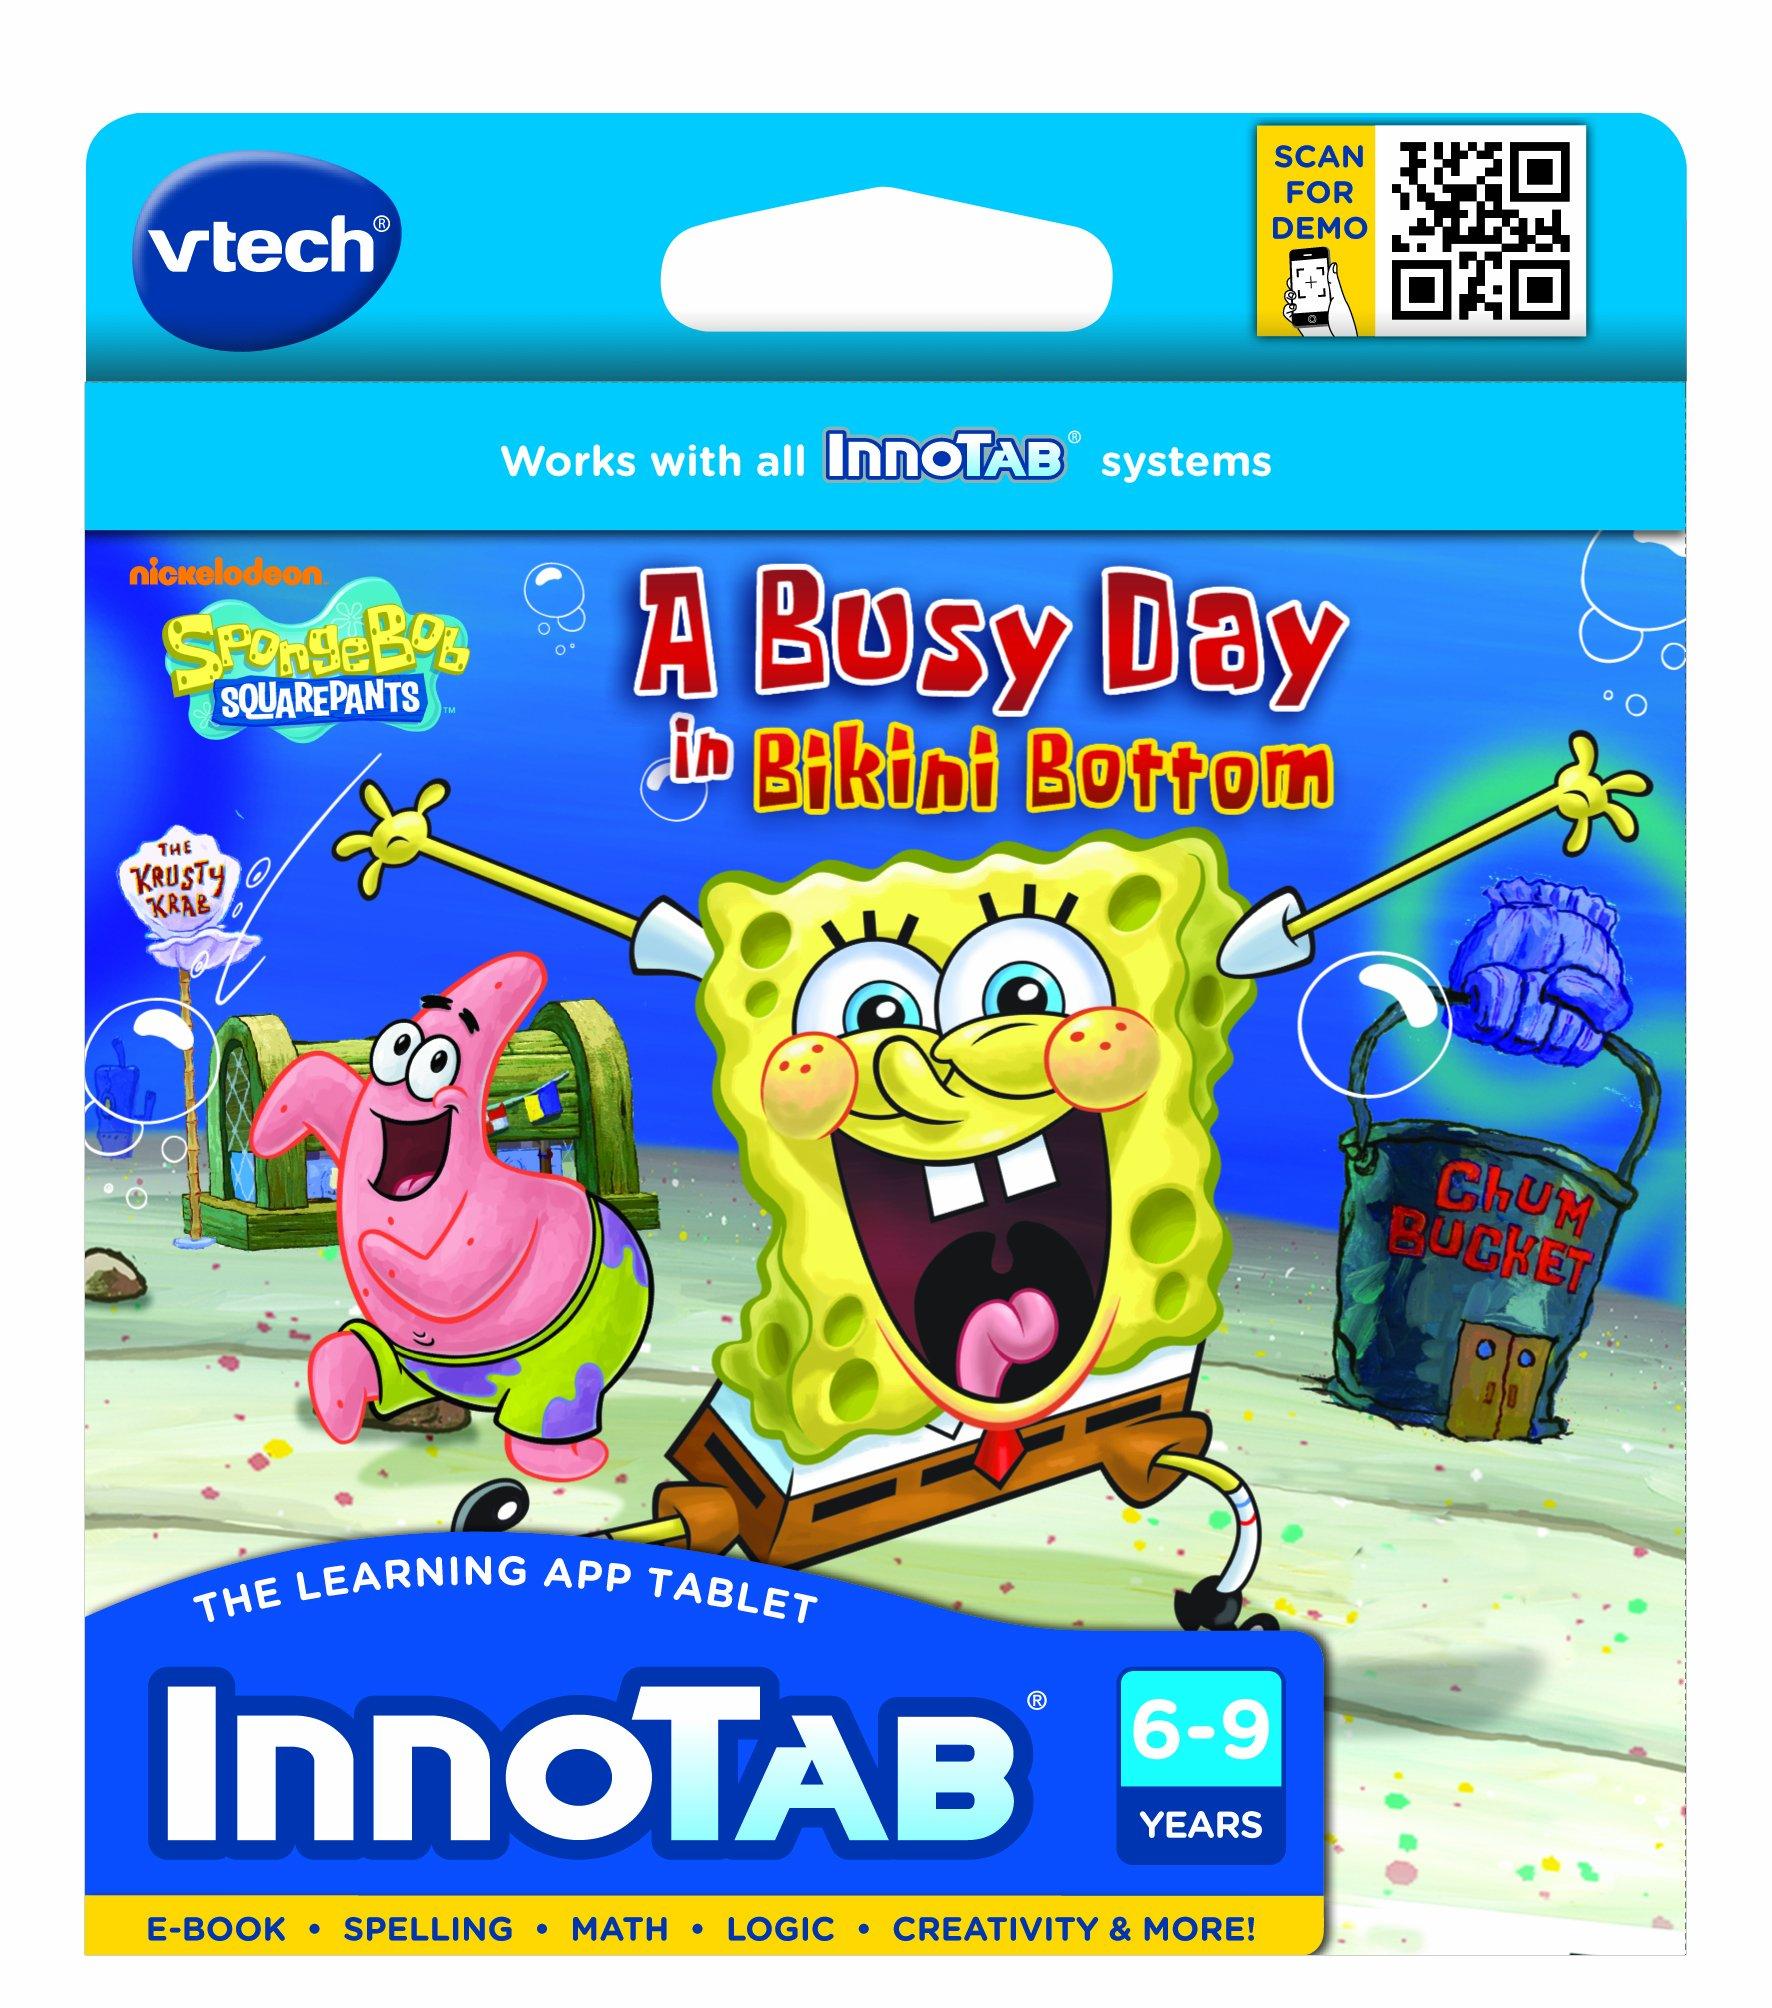 VTech - InnoTab Software - SpongeBob SquarePants by VTech